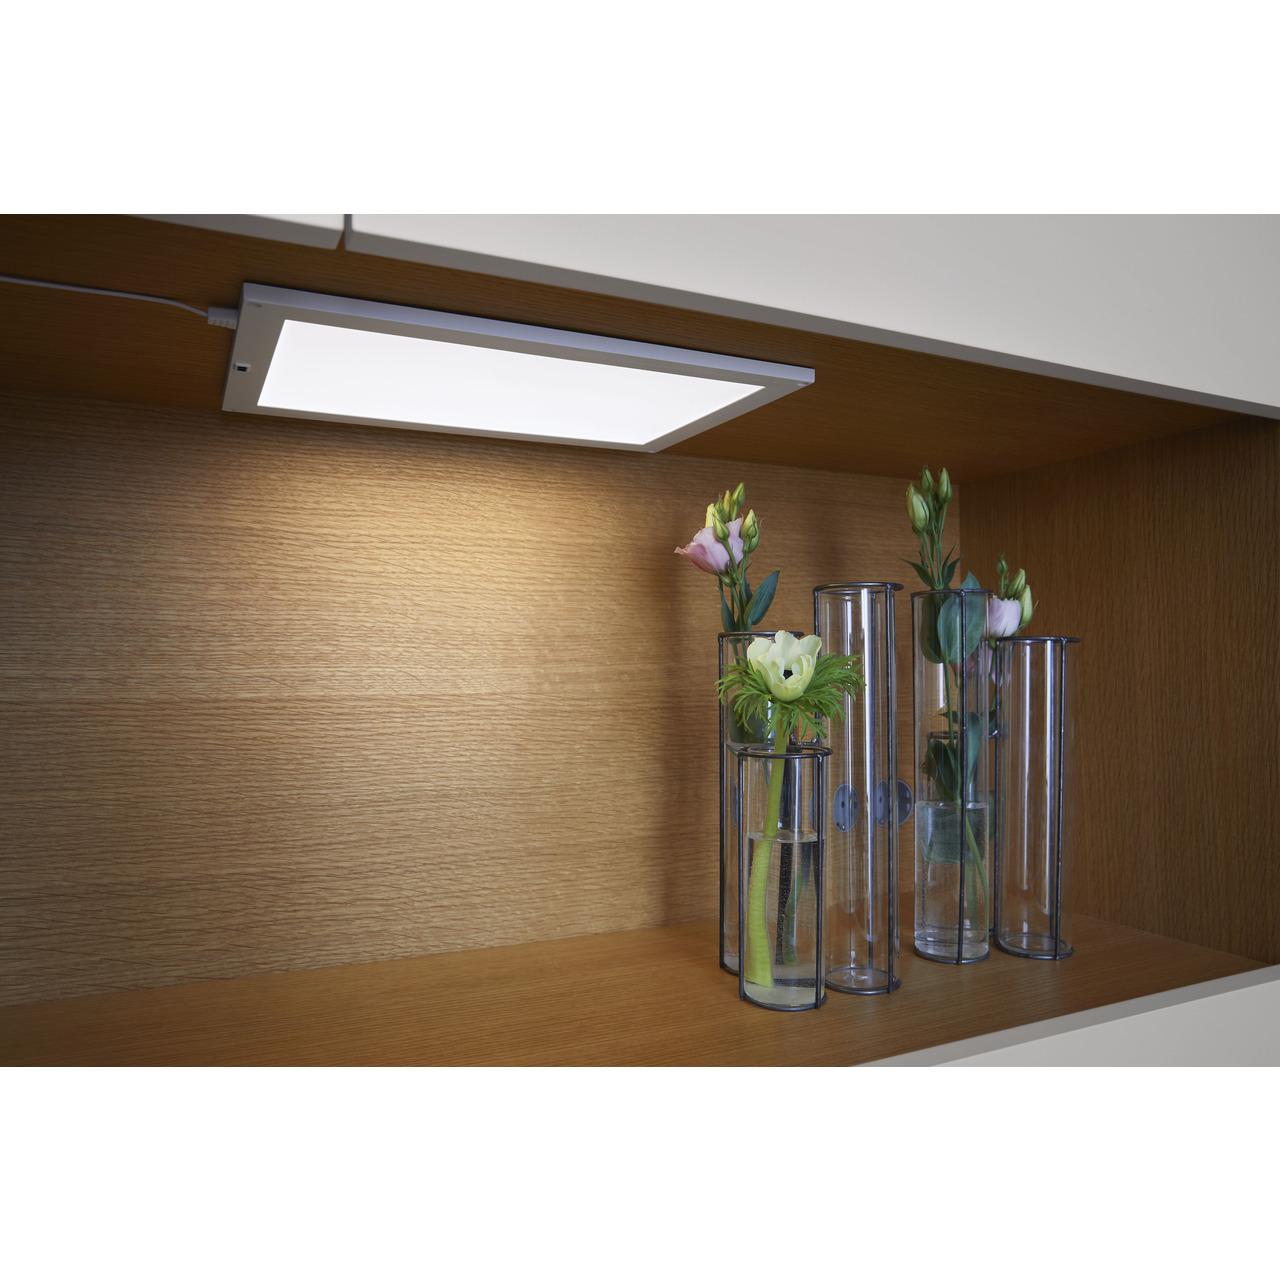 Ledvance 7-5-W-LED-Panel CABINET- 300 x 200 mm- mit Bewegungssensor- stufenlos dimmbar- IP20